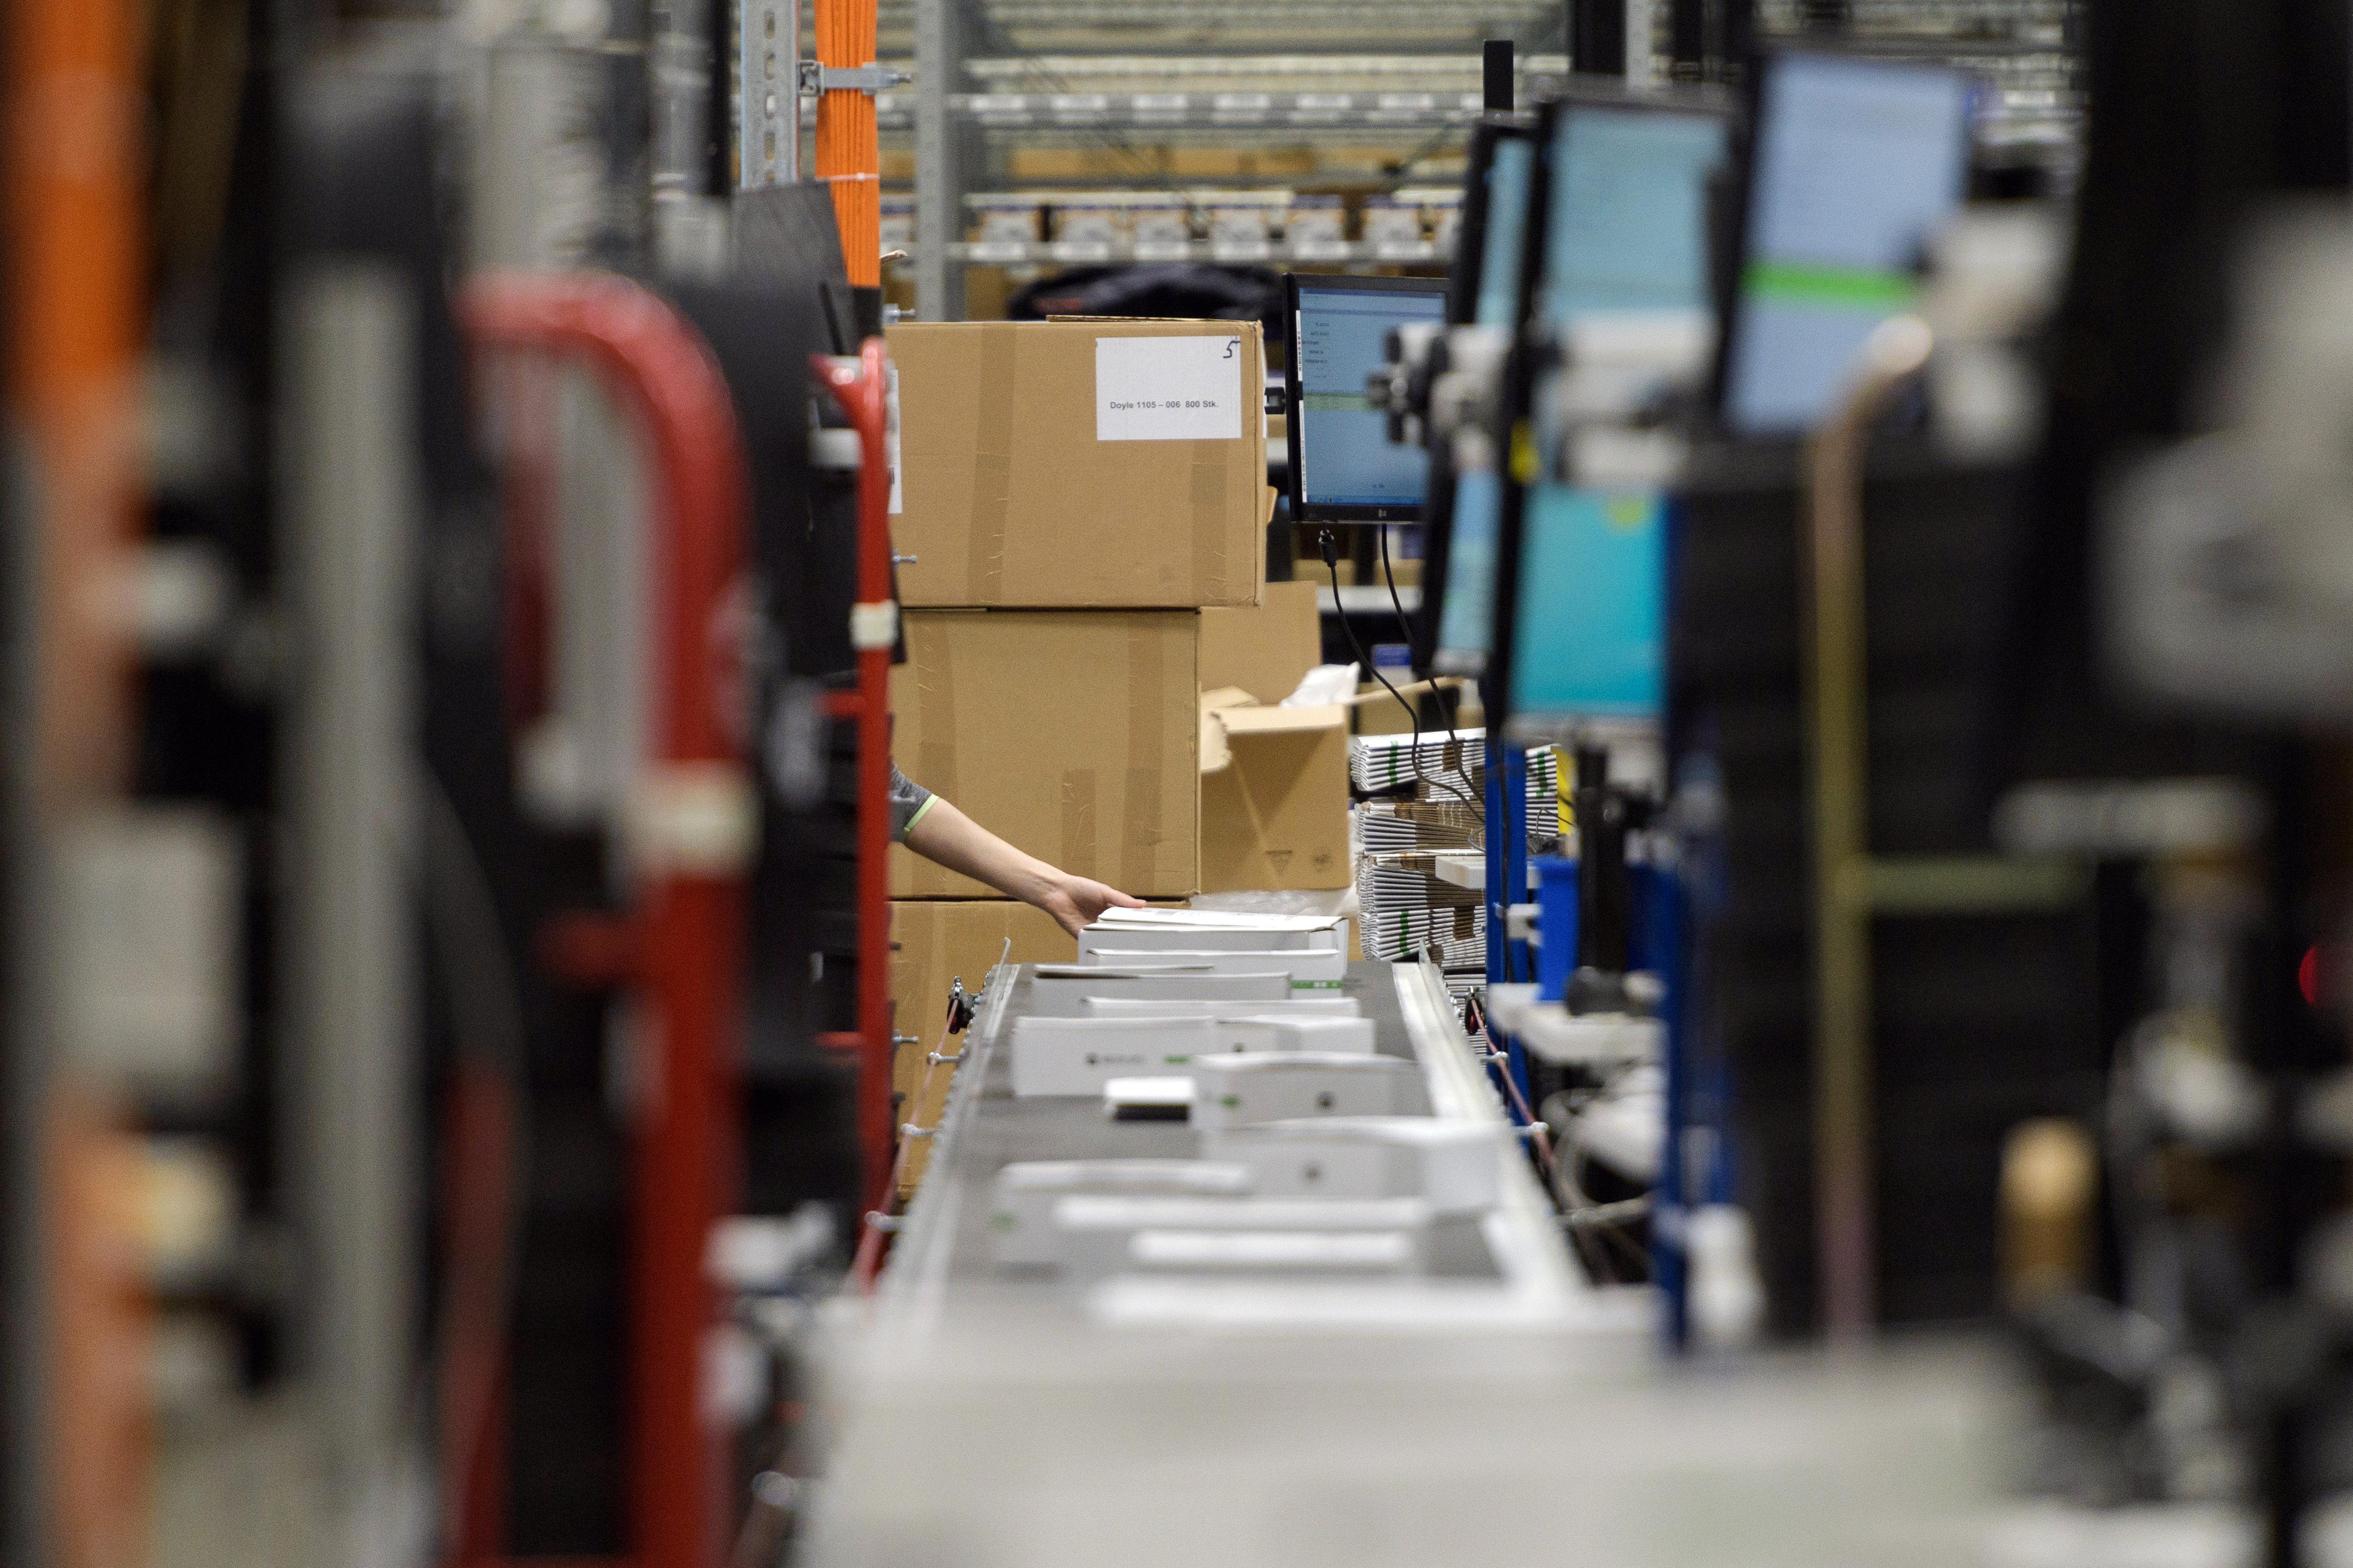 The logistics department of Mister Spex